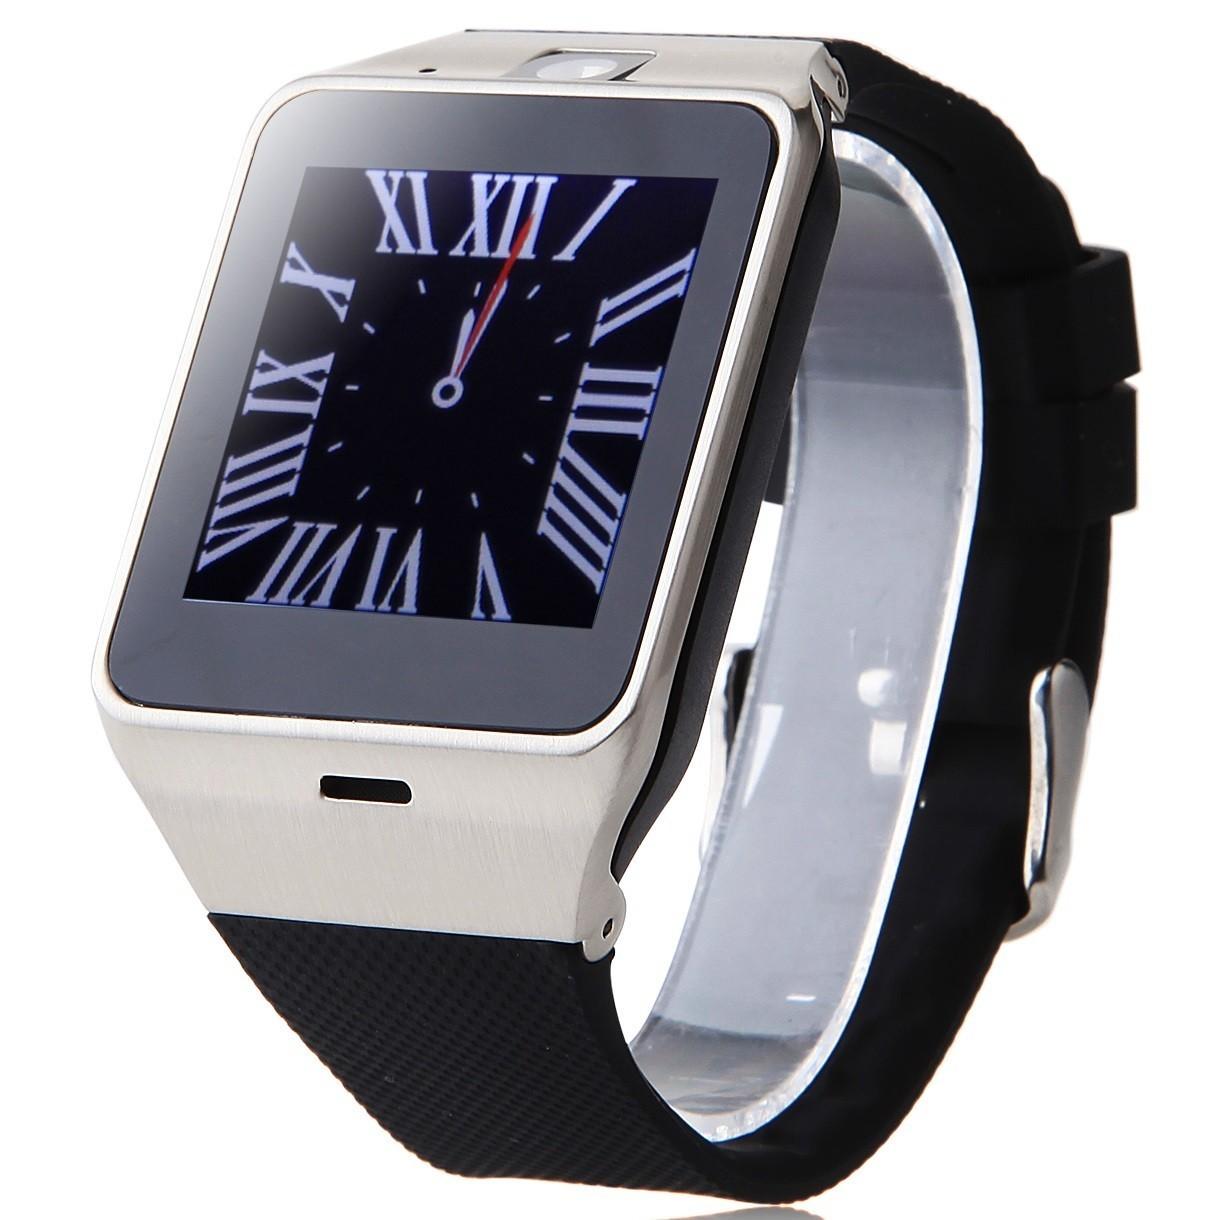 Ceas Smartwatch cu telefon iUni U15 A+, Camera, BT, 1.5 Inch, Carcasa metalica, Argintiu imagine techstar.ro 2021